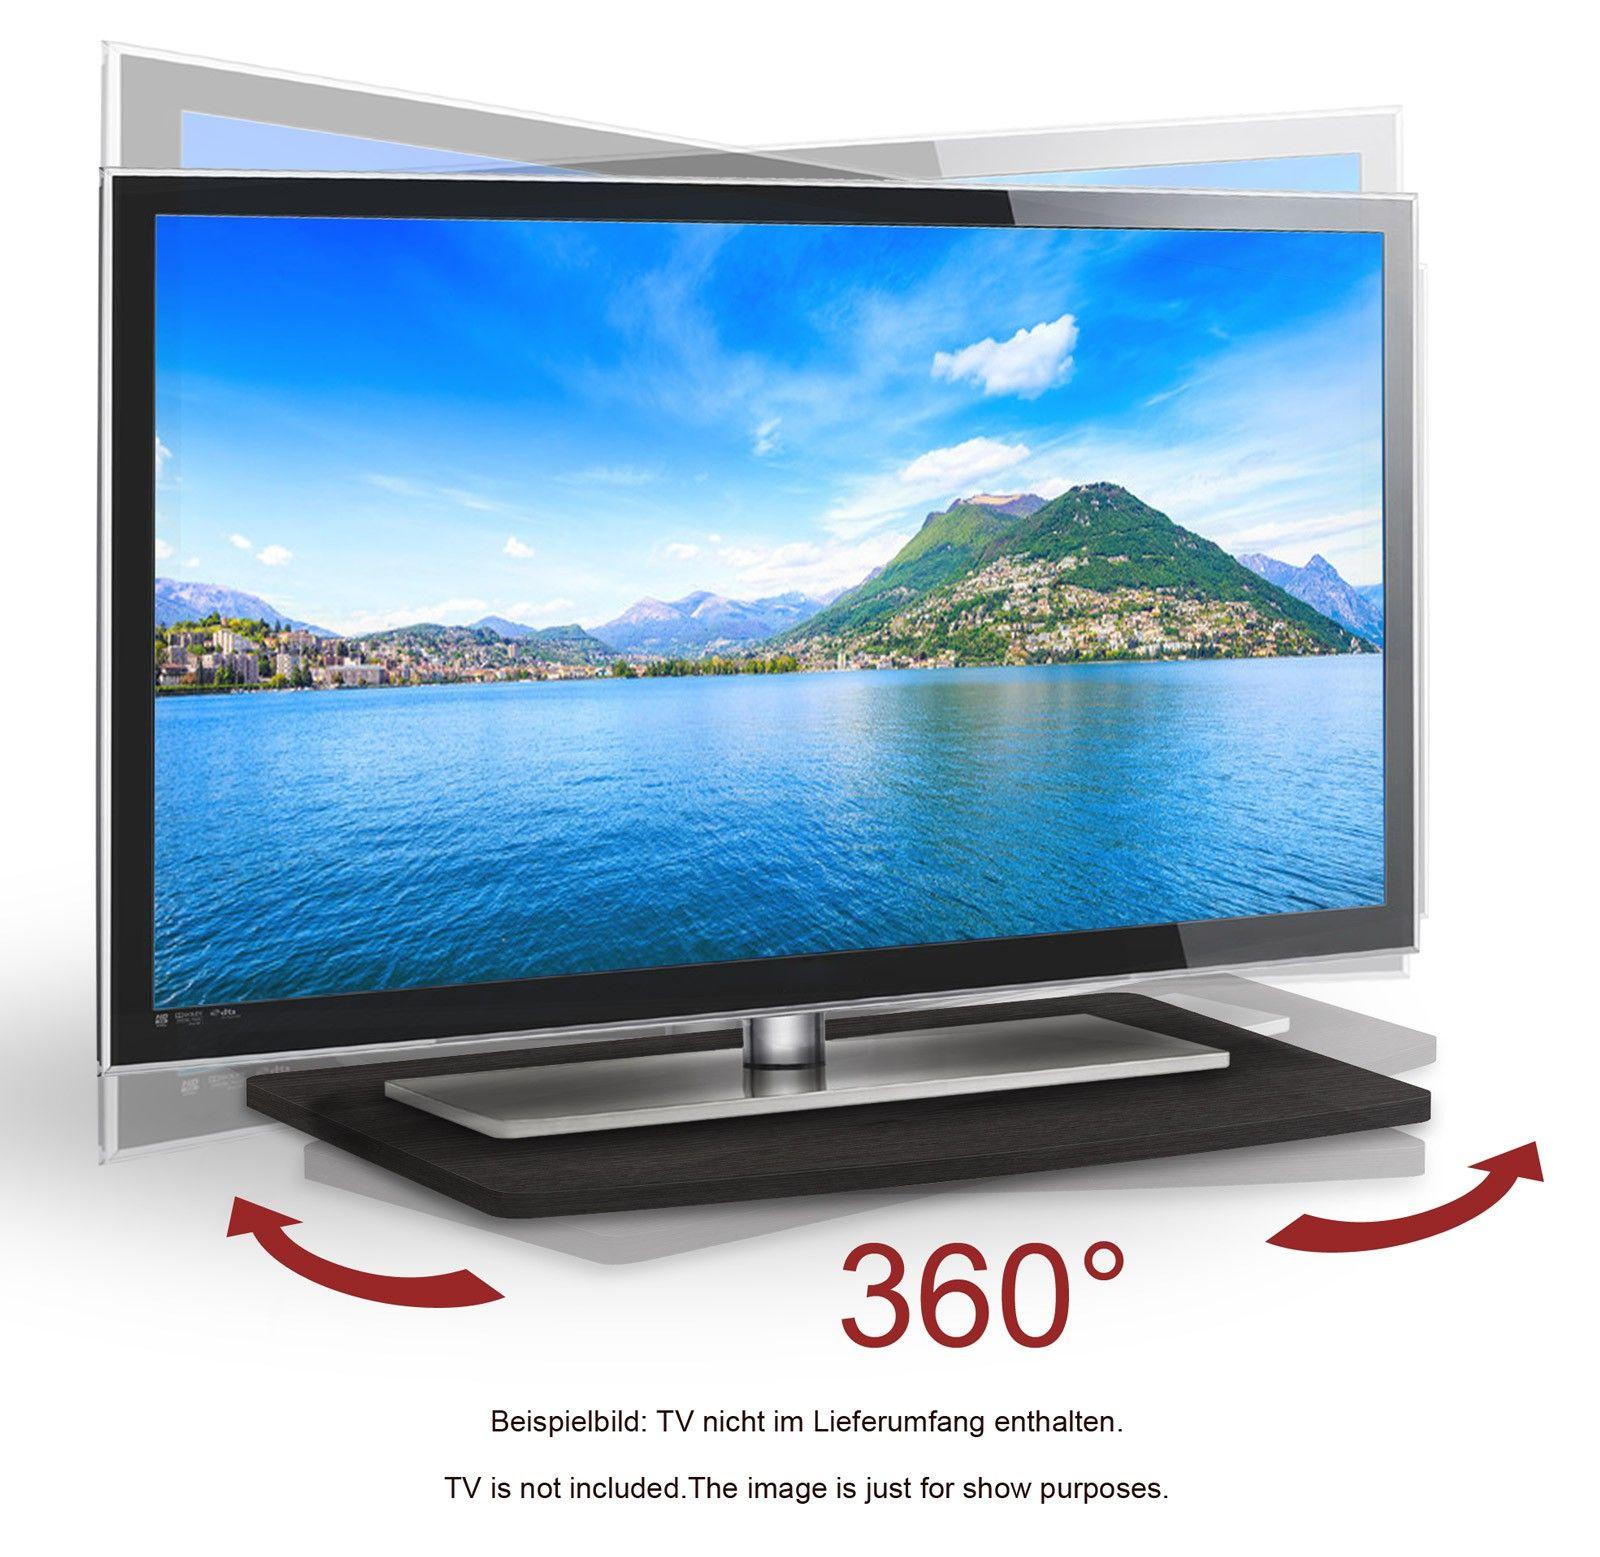 Drehbarer Tv Untersatz Drehteller 360 Drehbar Fs053 Fernseher